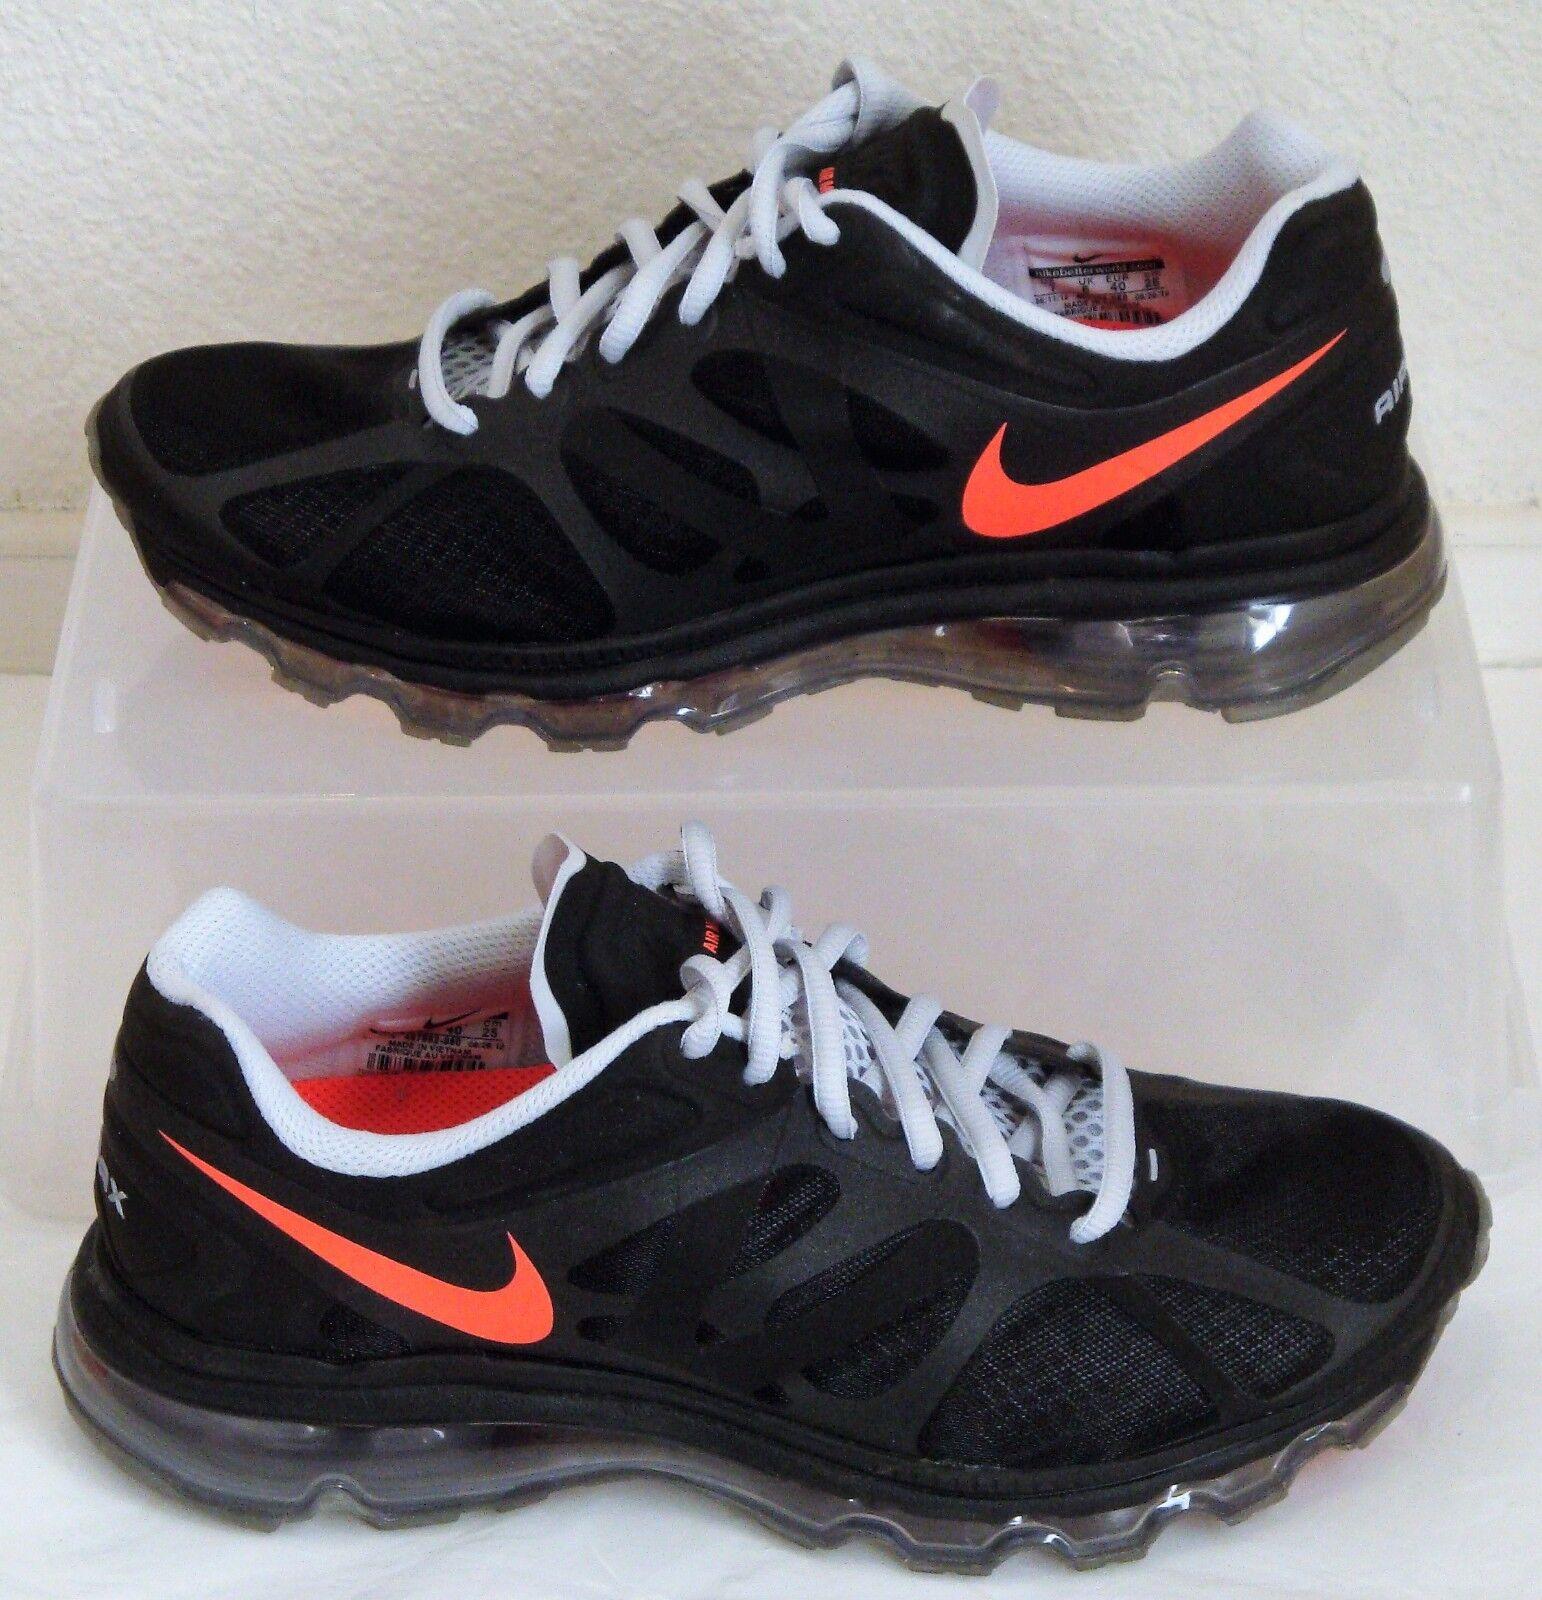 New Nike Shoes Air Max 2018 Black Crimson Mens US Size 7 CM 25